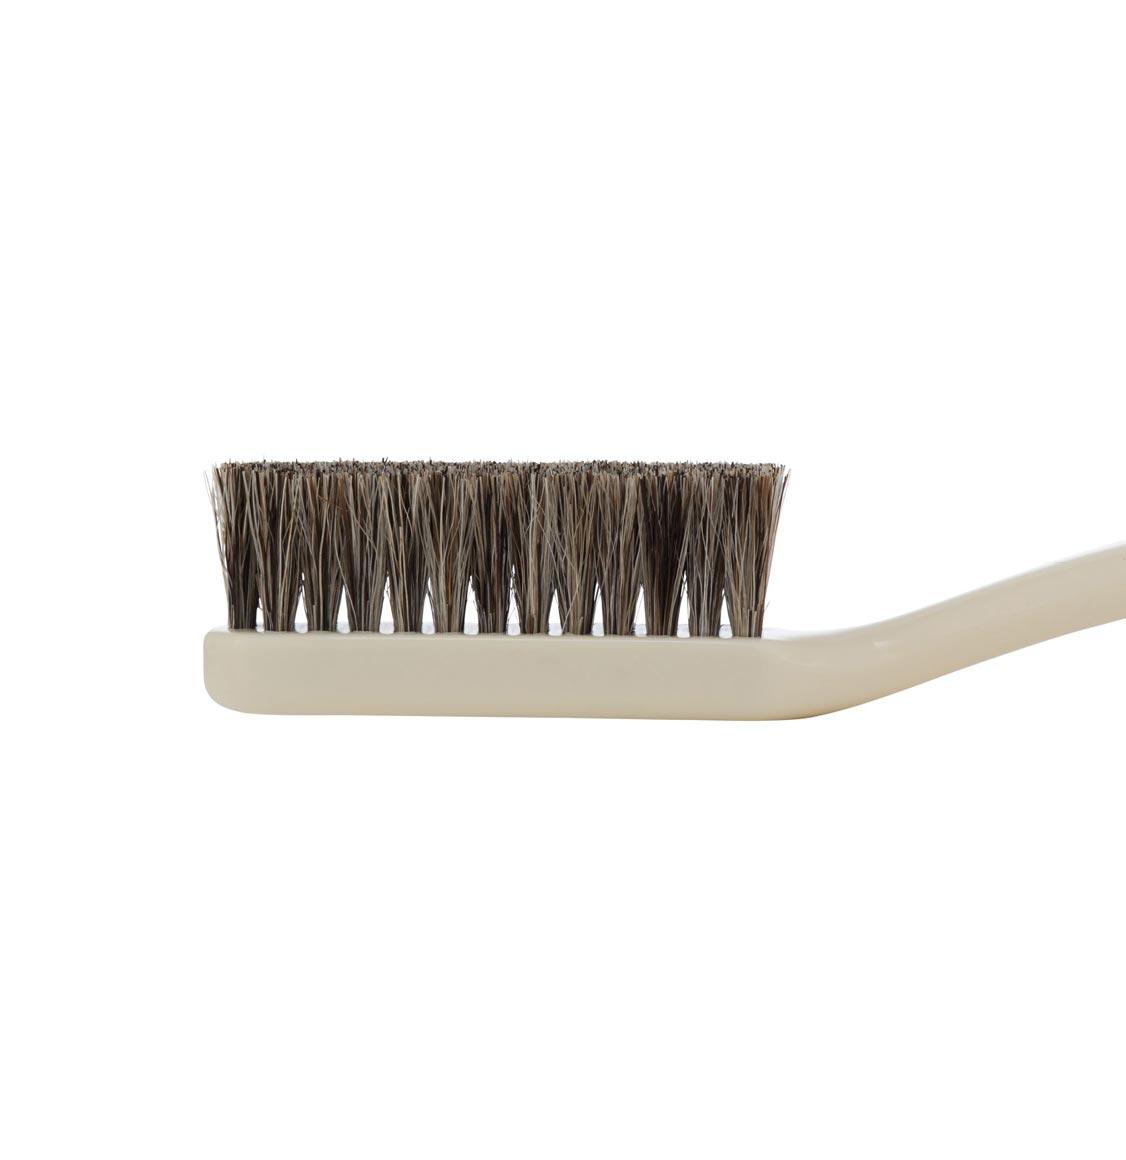 D R Harris Super Soft Badger Bristle Toothbrush